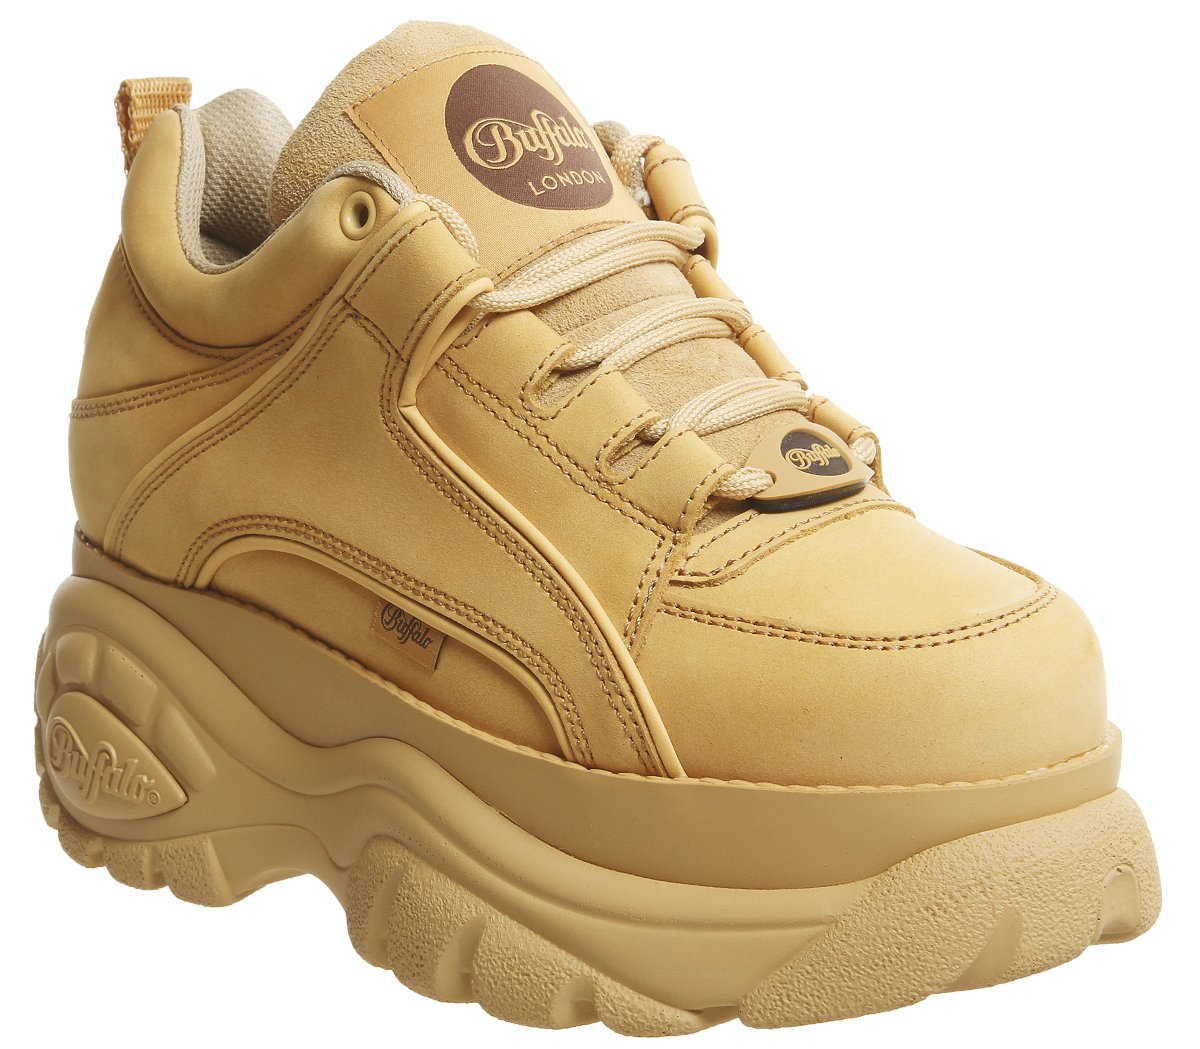 Honey BUFFALO 1339-14 2.0 Femme Chaussures Chaussures Fauve